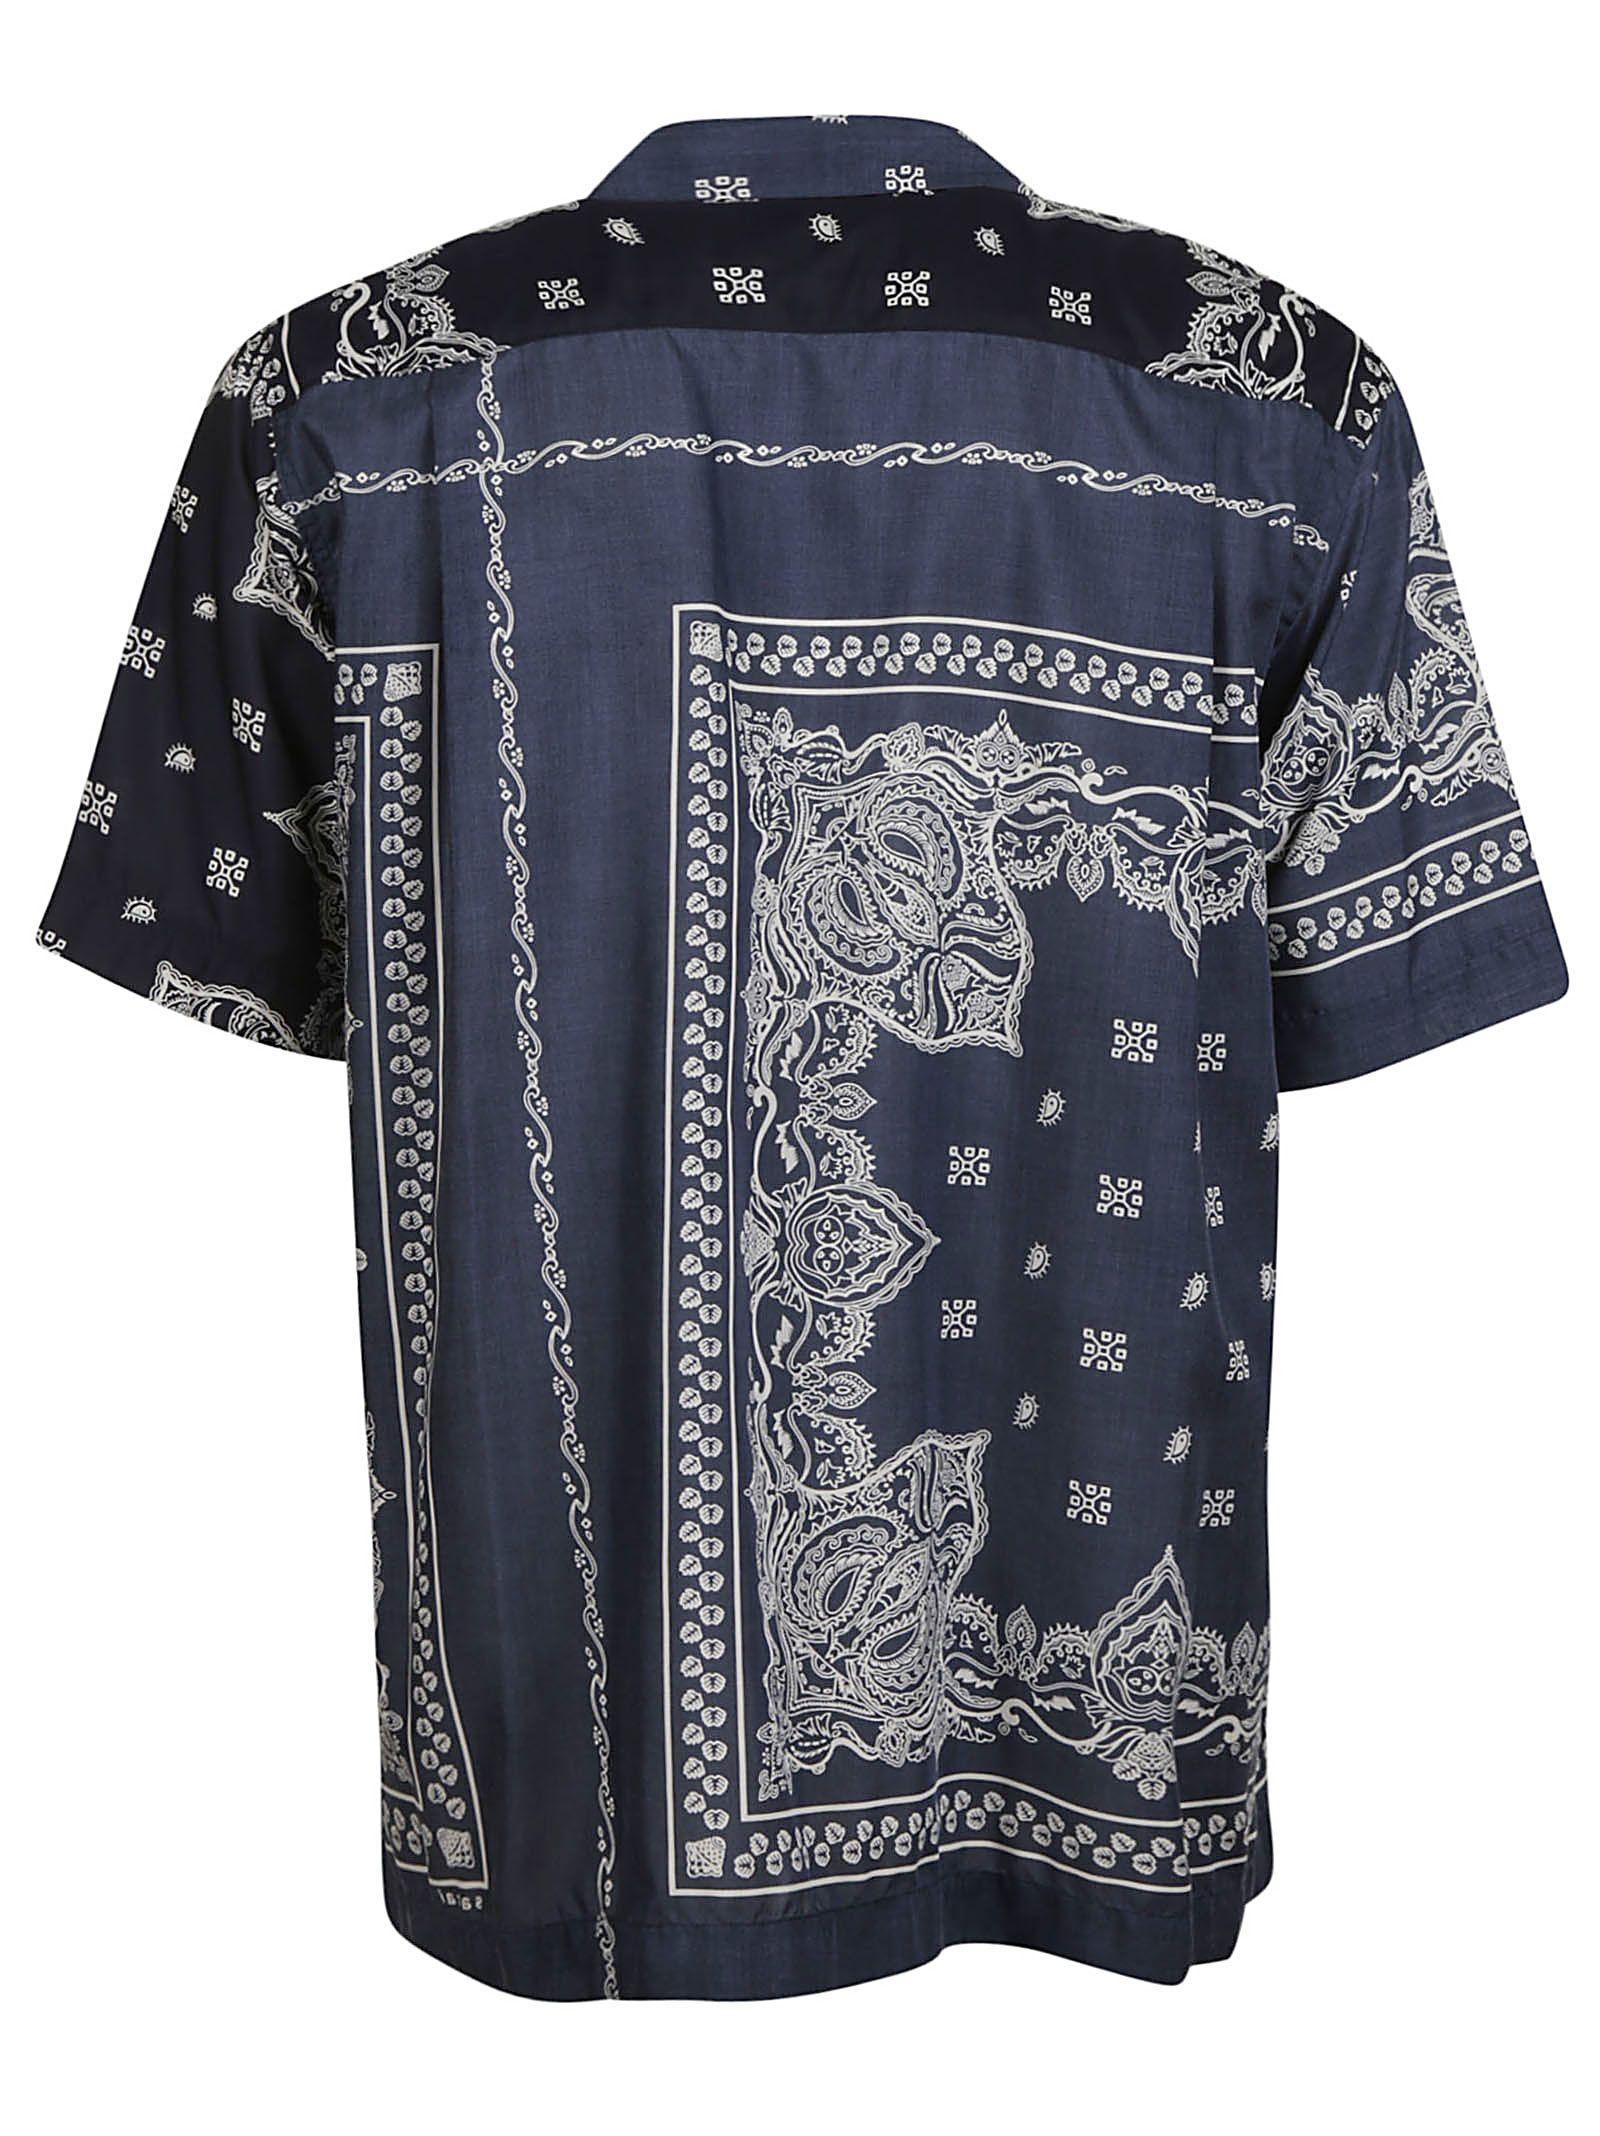 dab8d8cd07d Sacai Check Printed Back Tshirt in 2019 Products Plaid T shirt